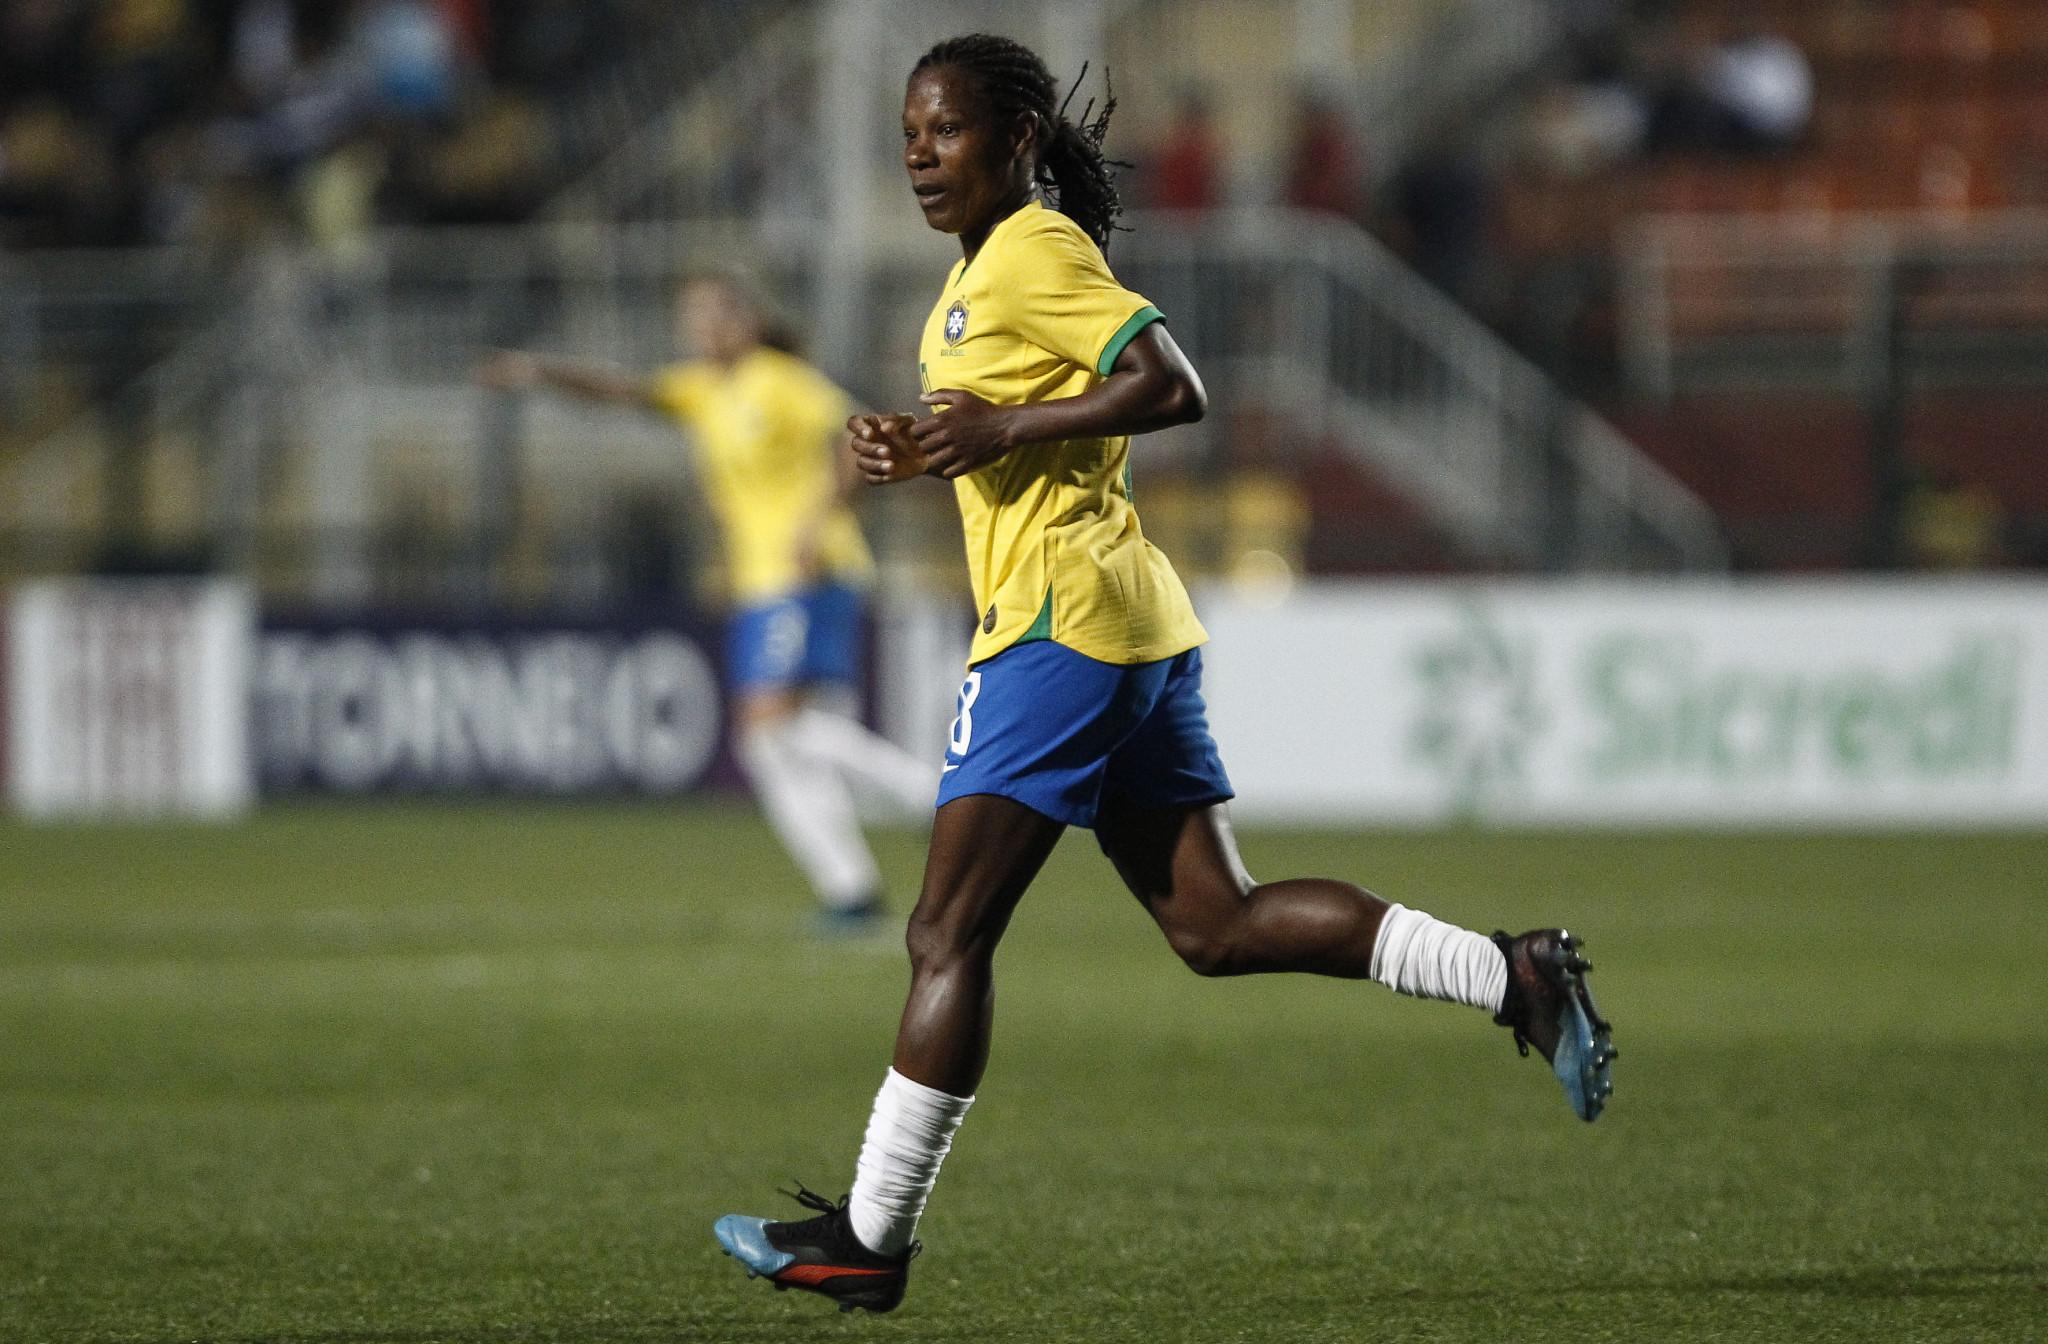 Brazil veteran Formiga still aims to end international career at seventh Olympic Games